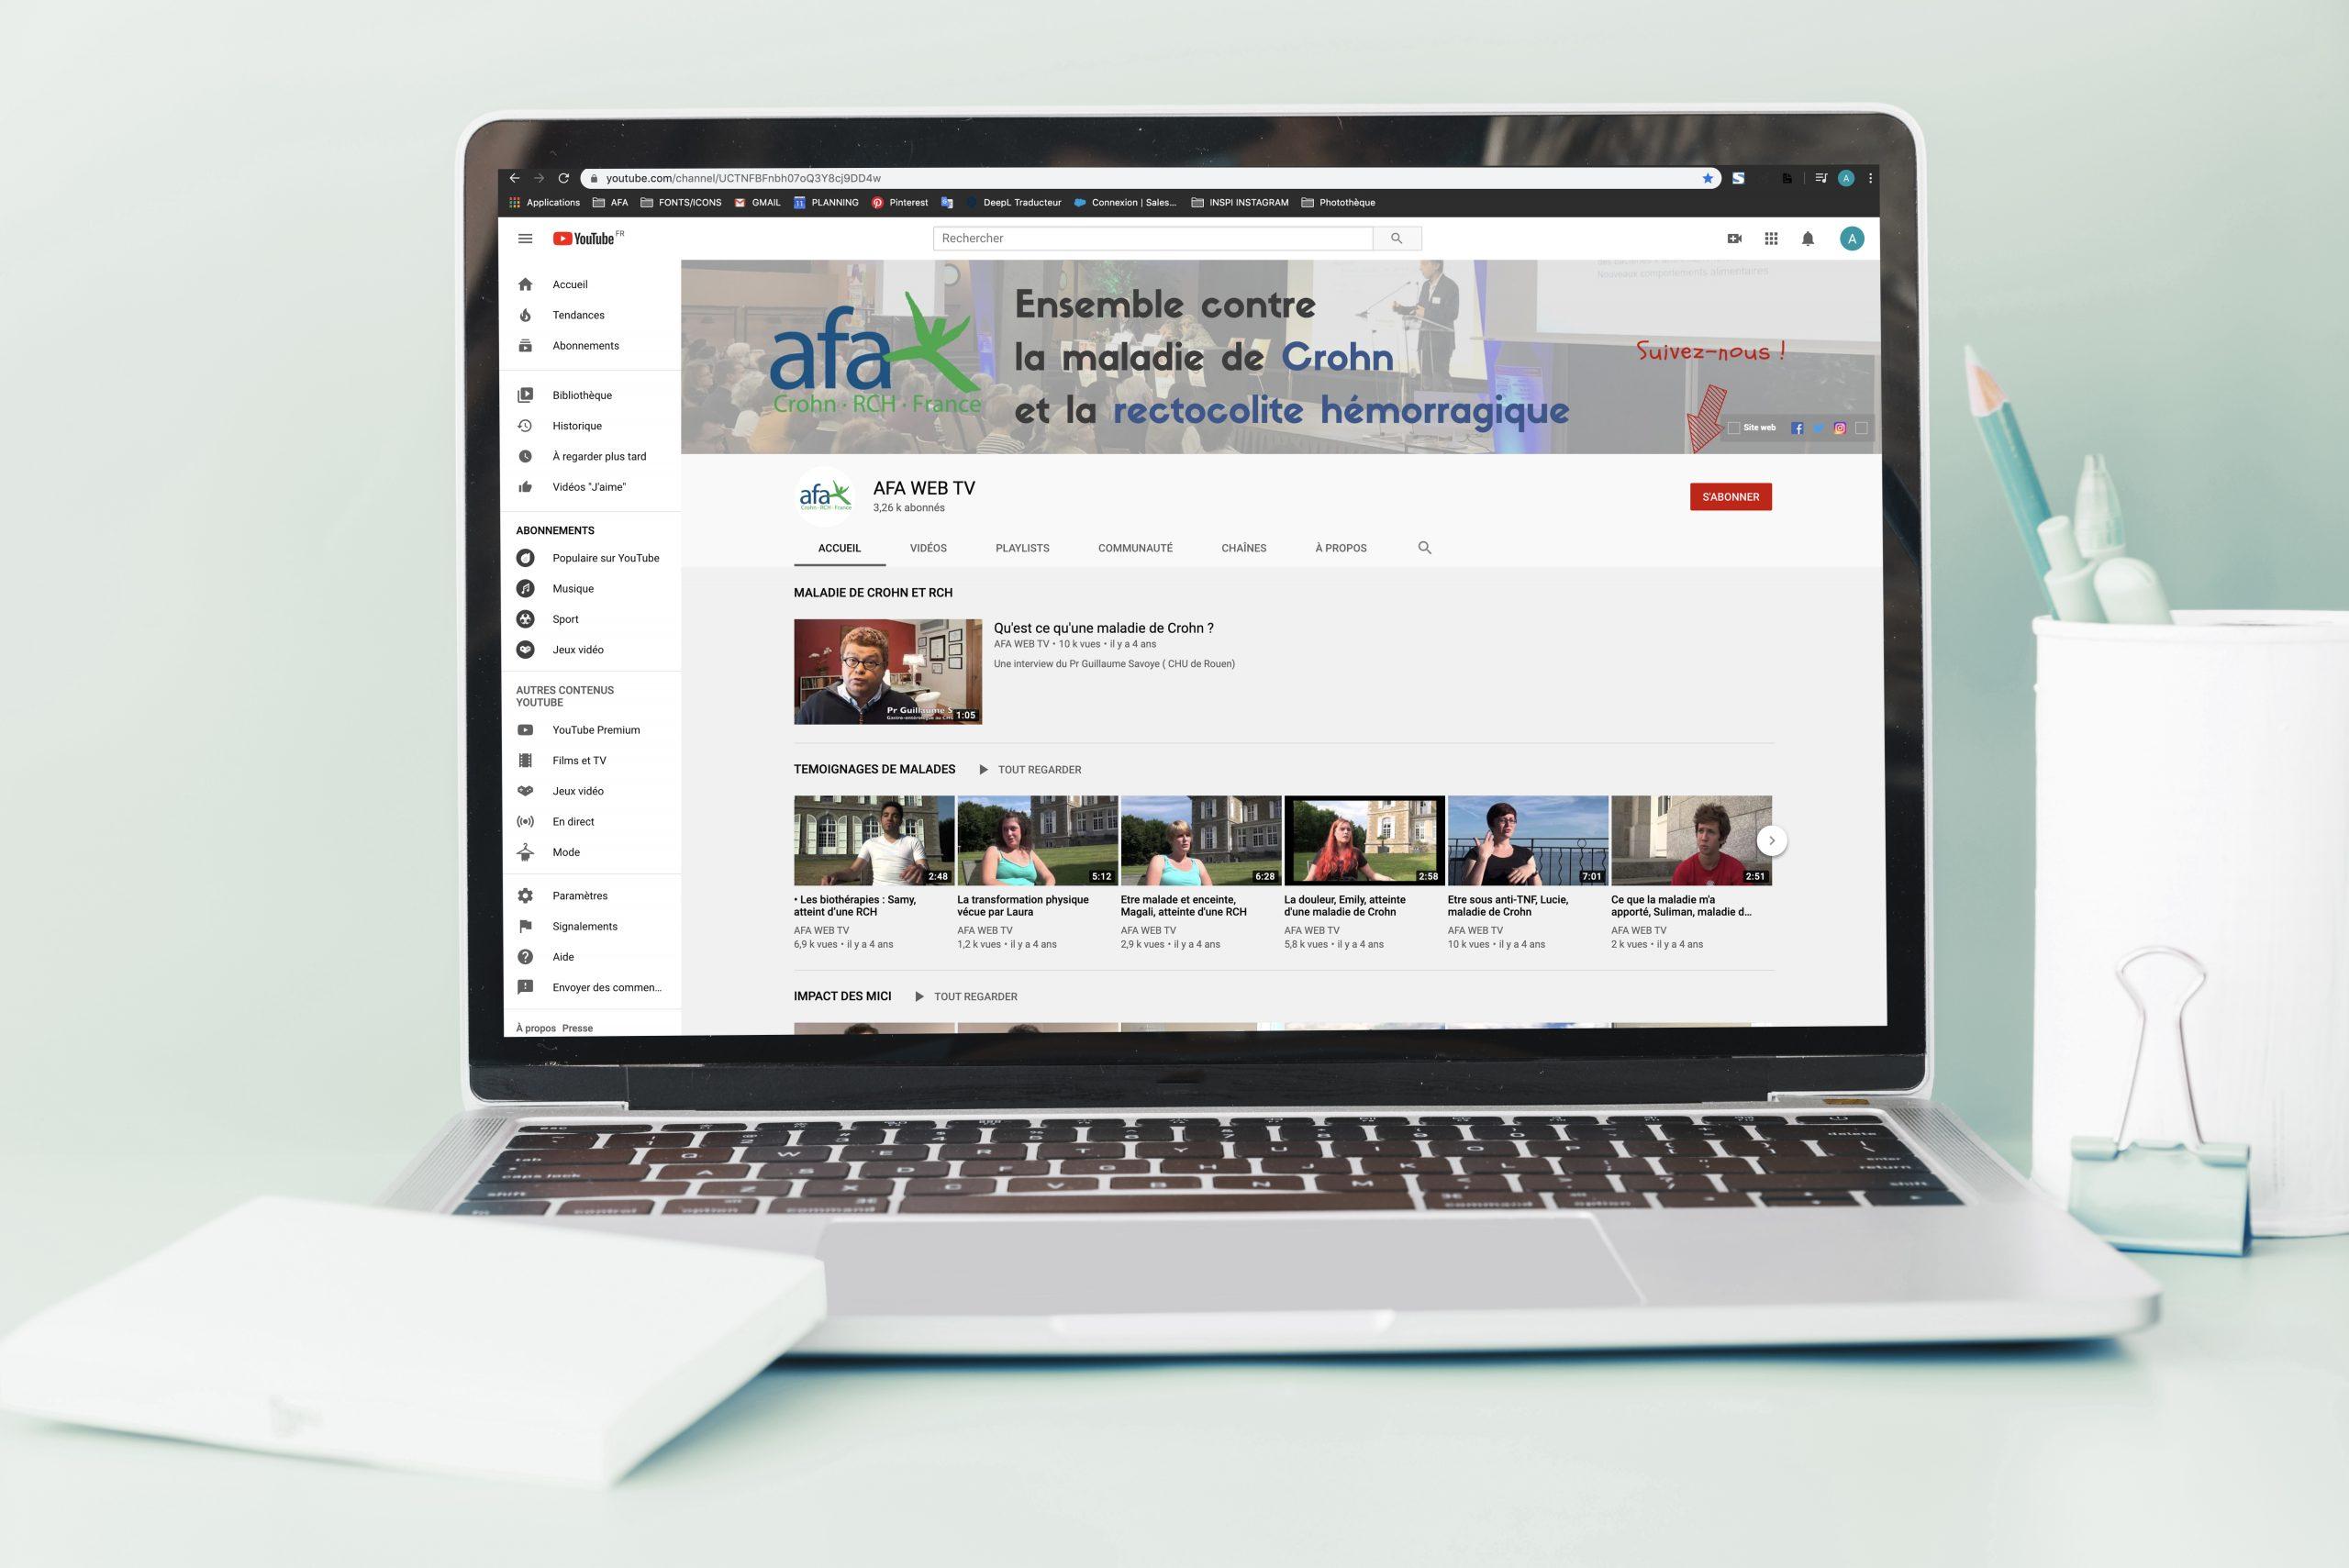 Afa Web TV